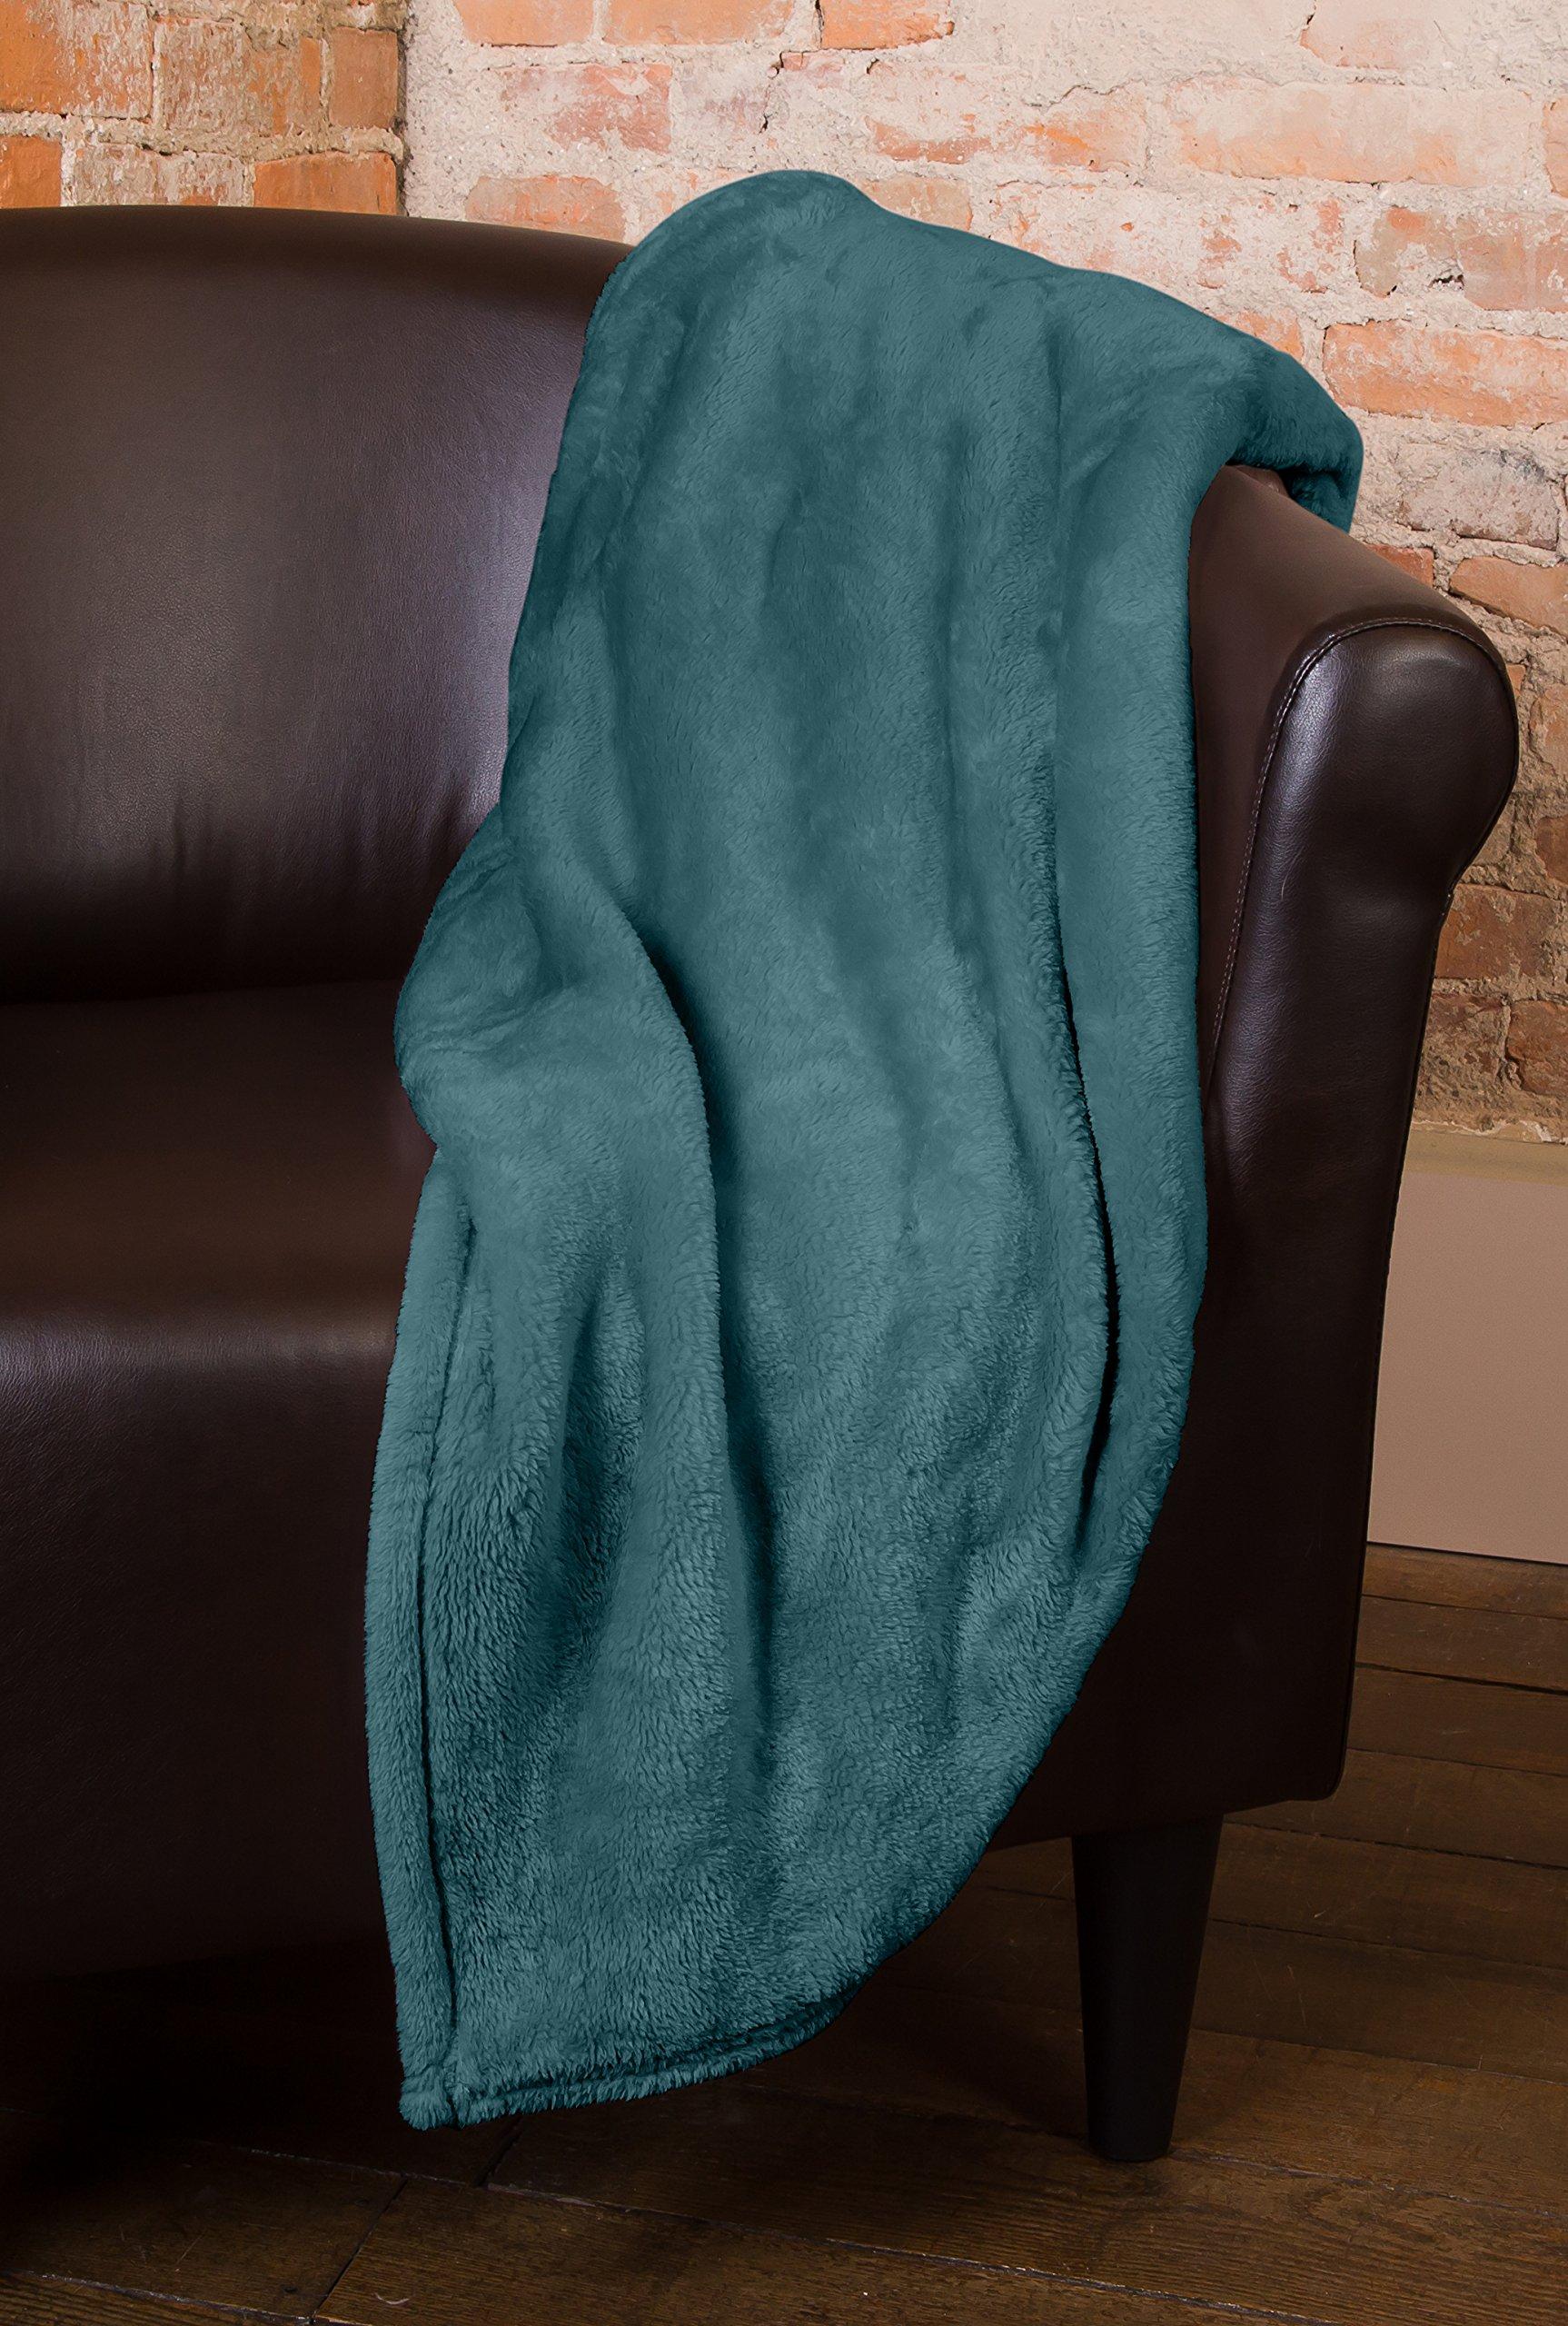 Elle Decor Silky Soft Thick Plush Throw Blanket (Piedmont, King Size 90 X 102)